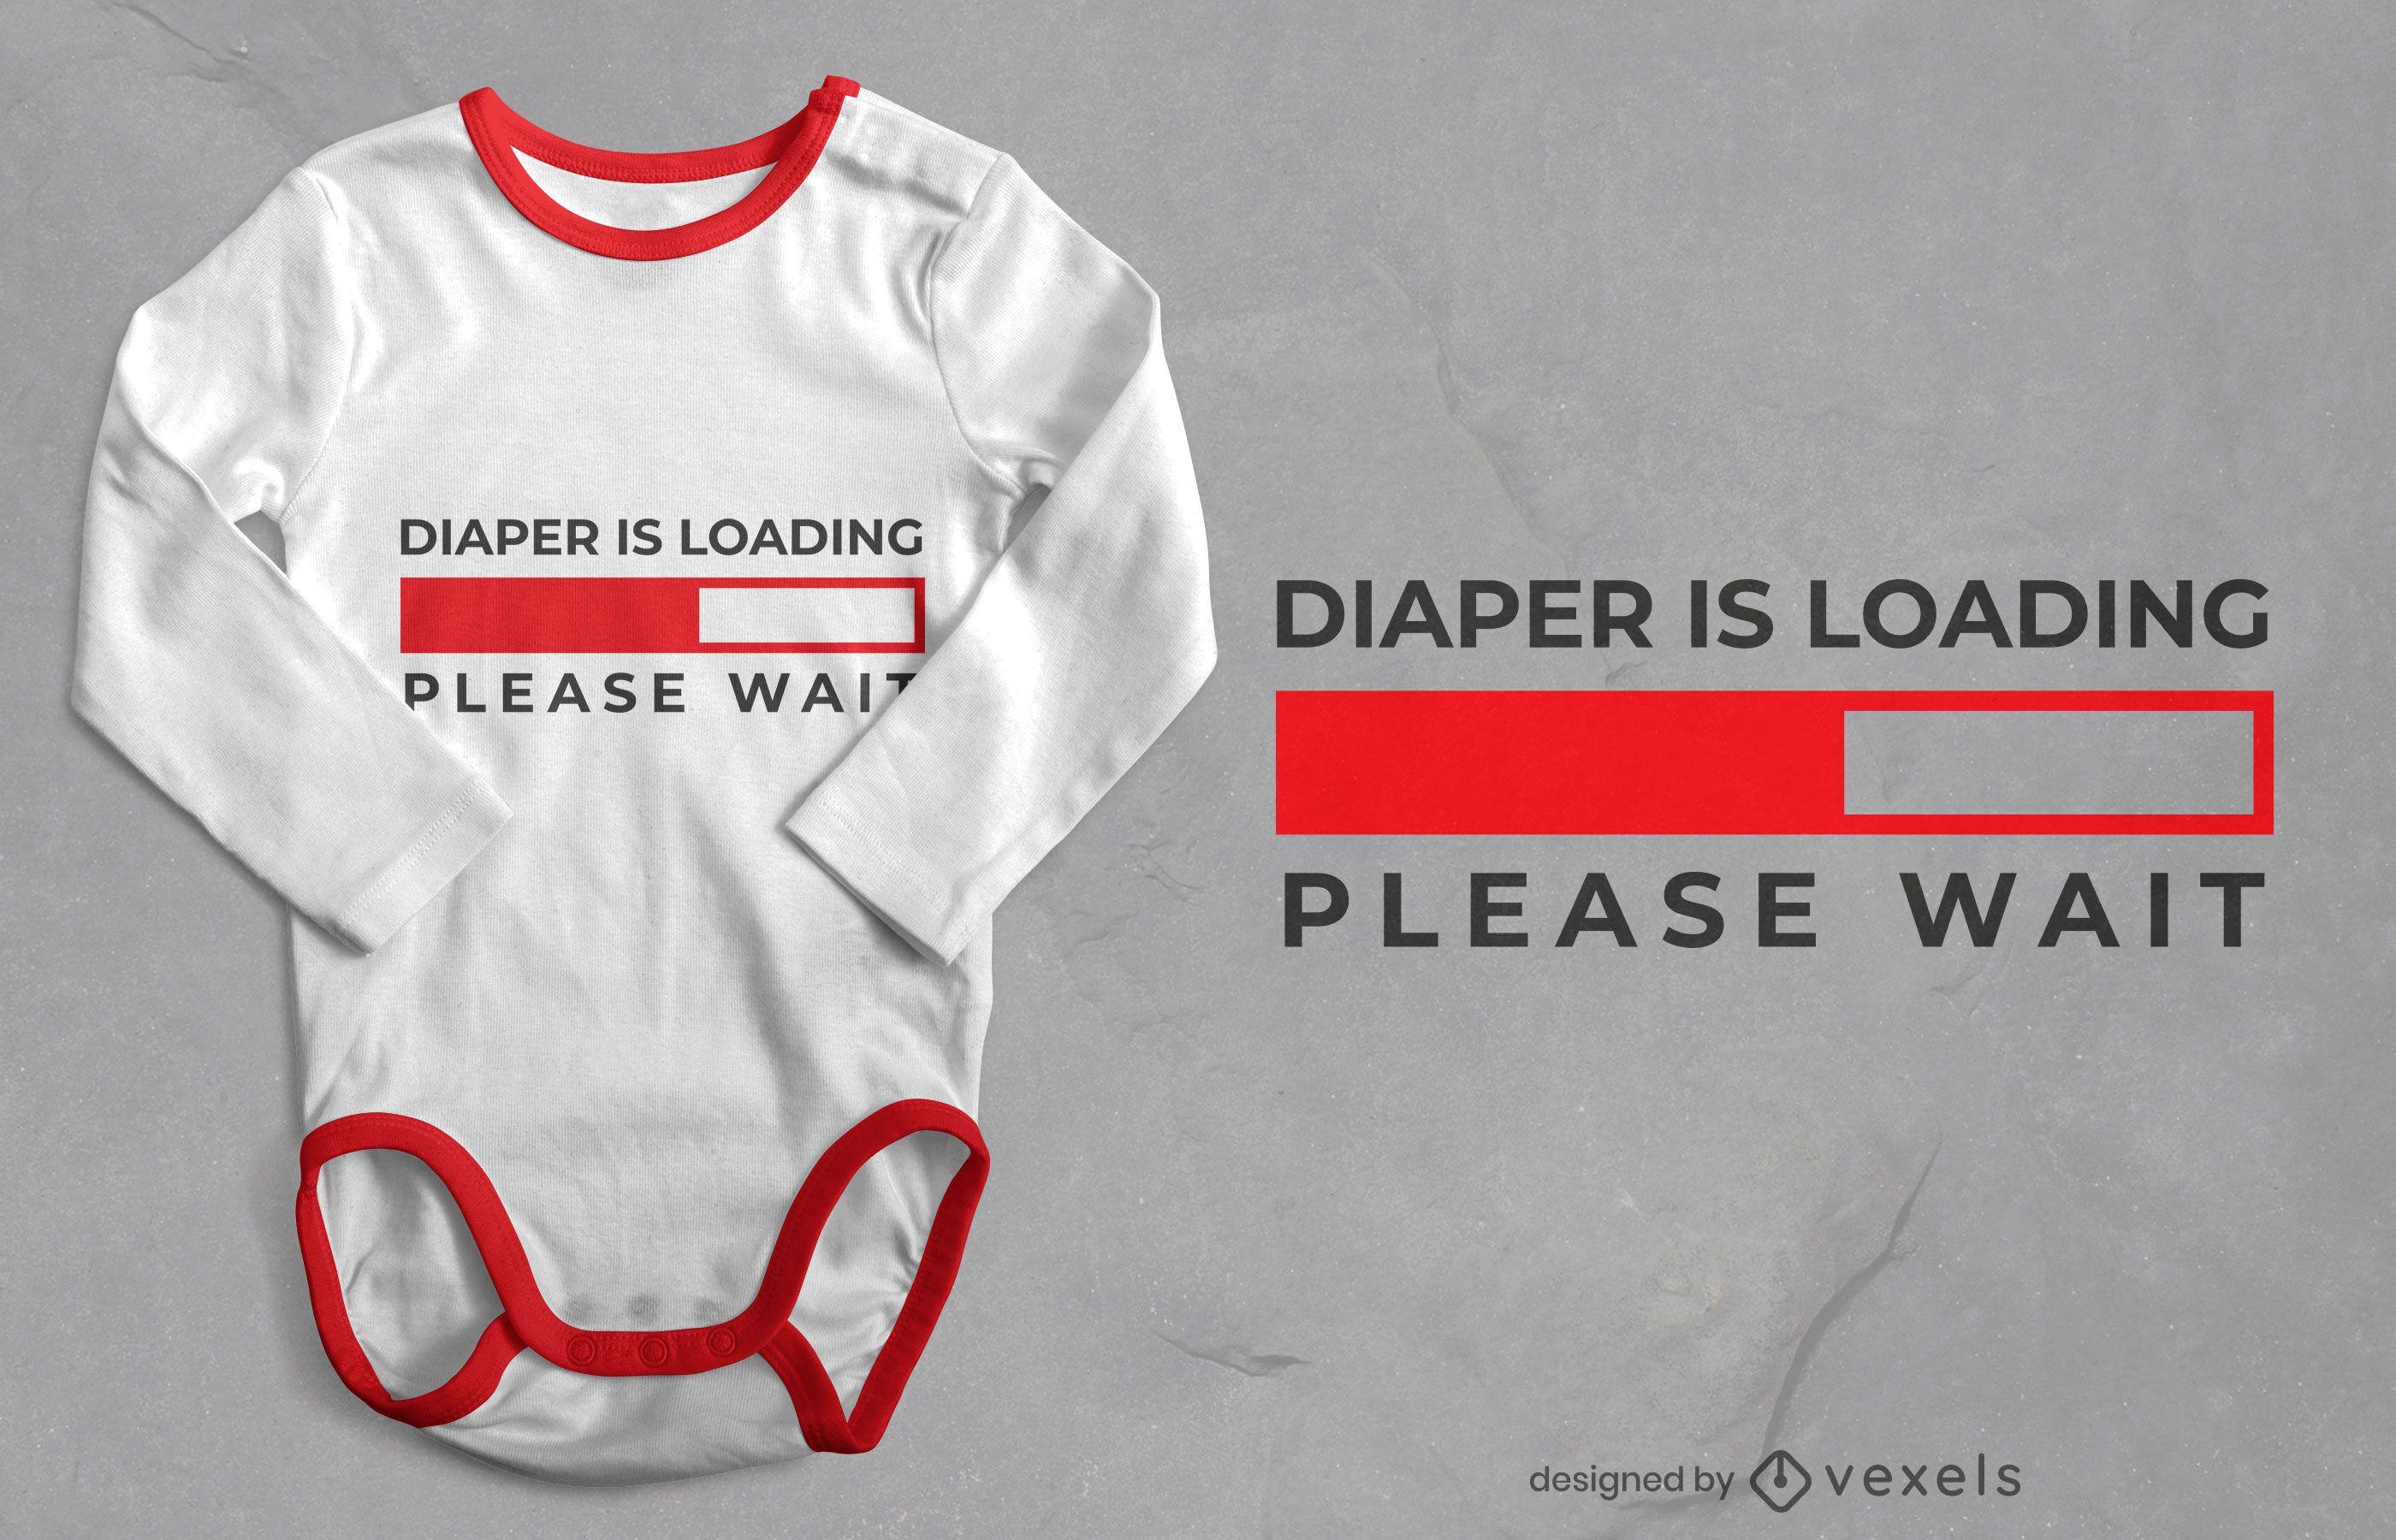 Diaper loading bar quote t-shirt design